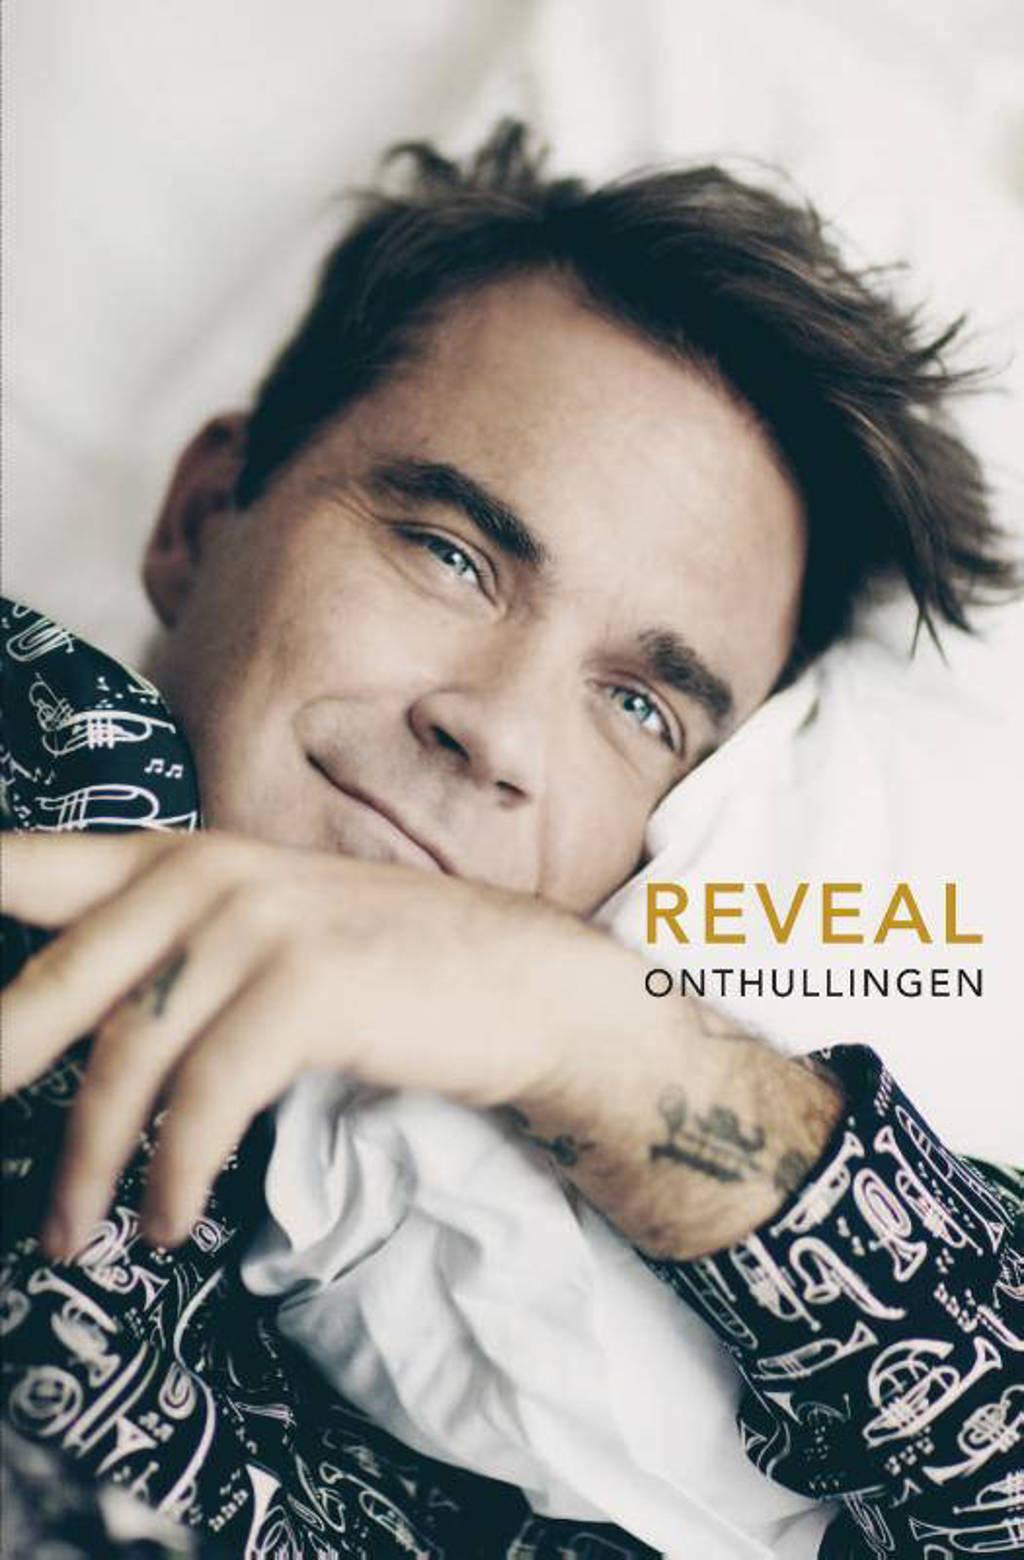 Reveal Robbie Williams - Chris Heath